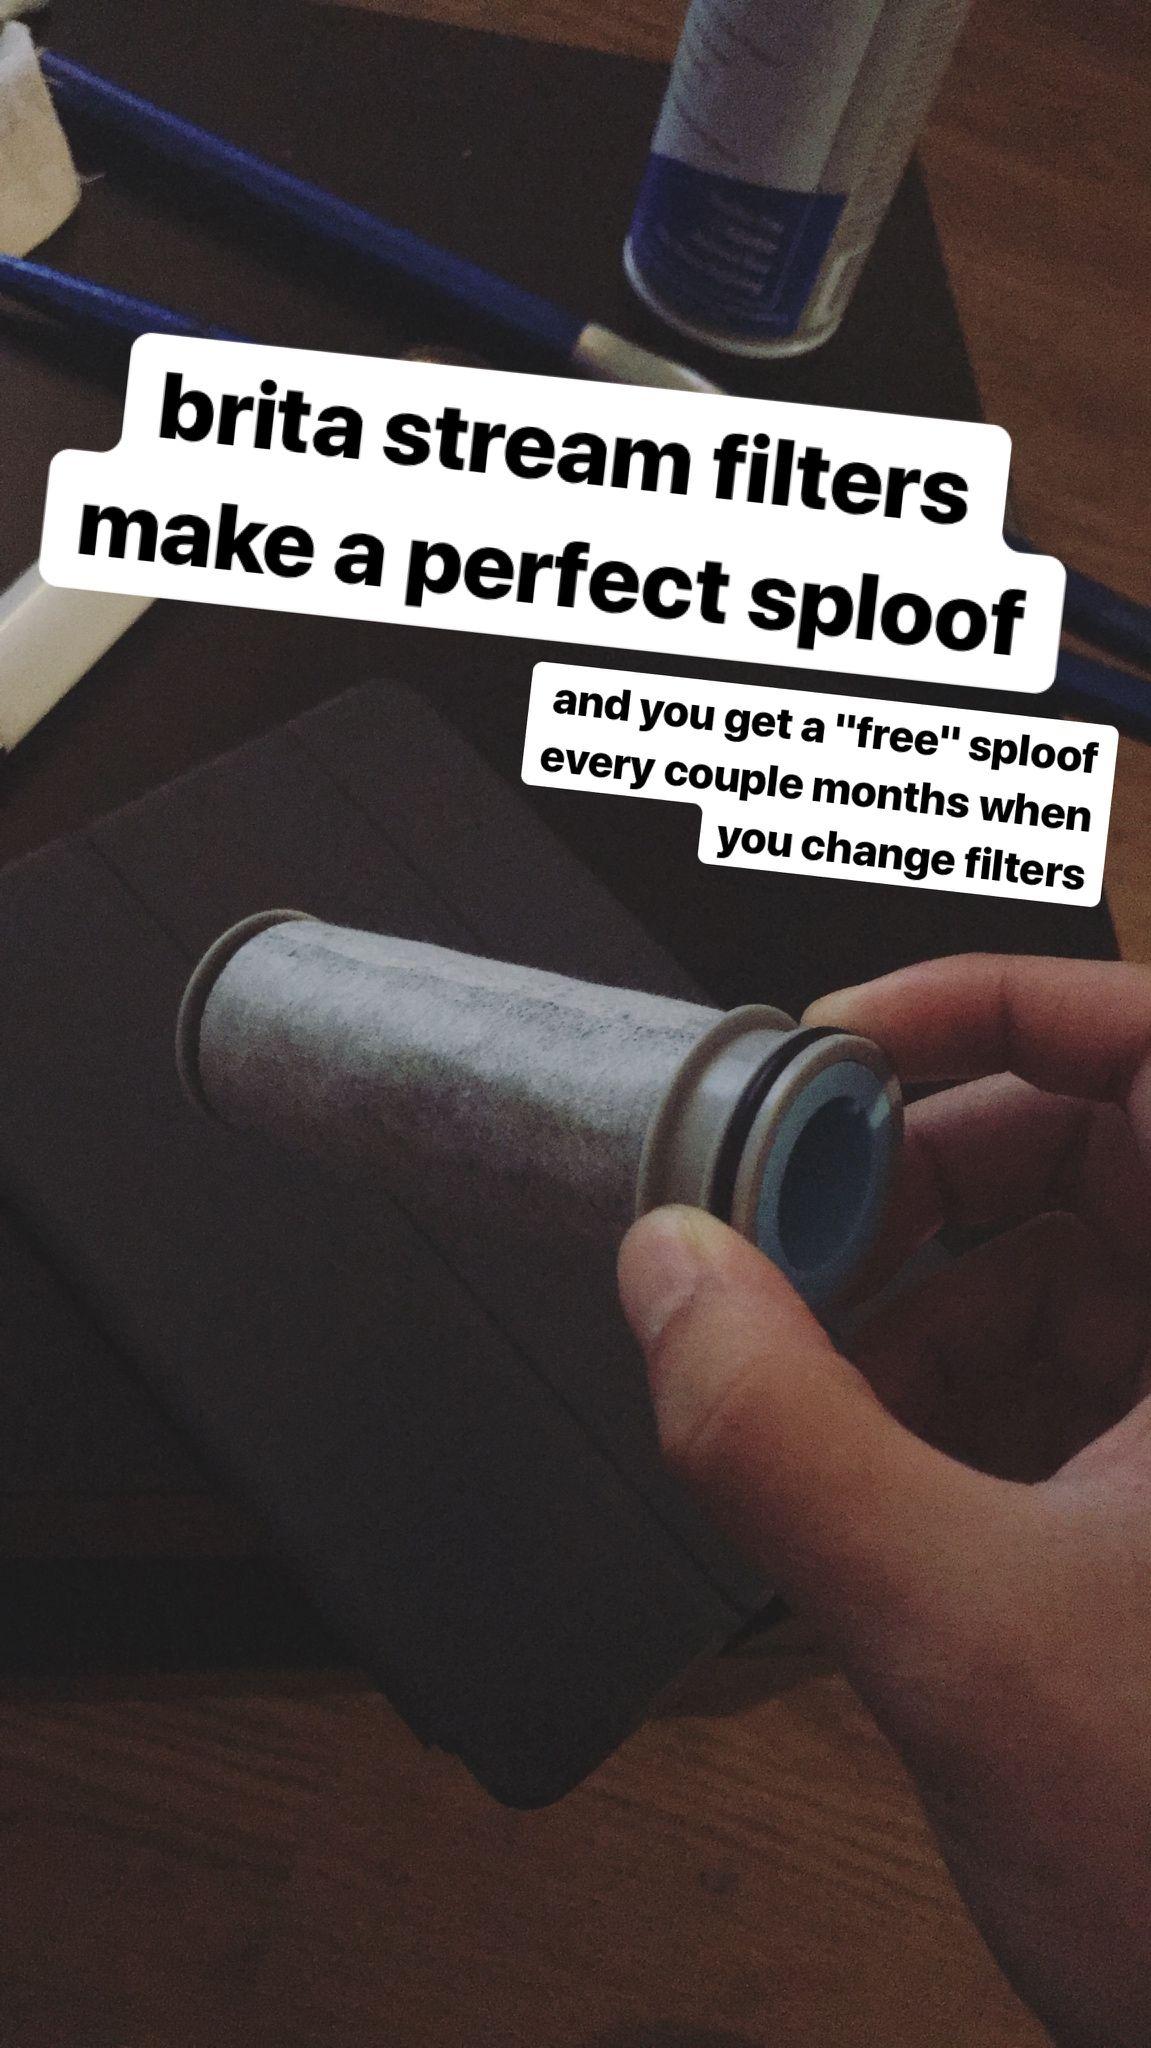 brita stream filters make the perfect sploof! (carbon filter